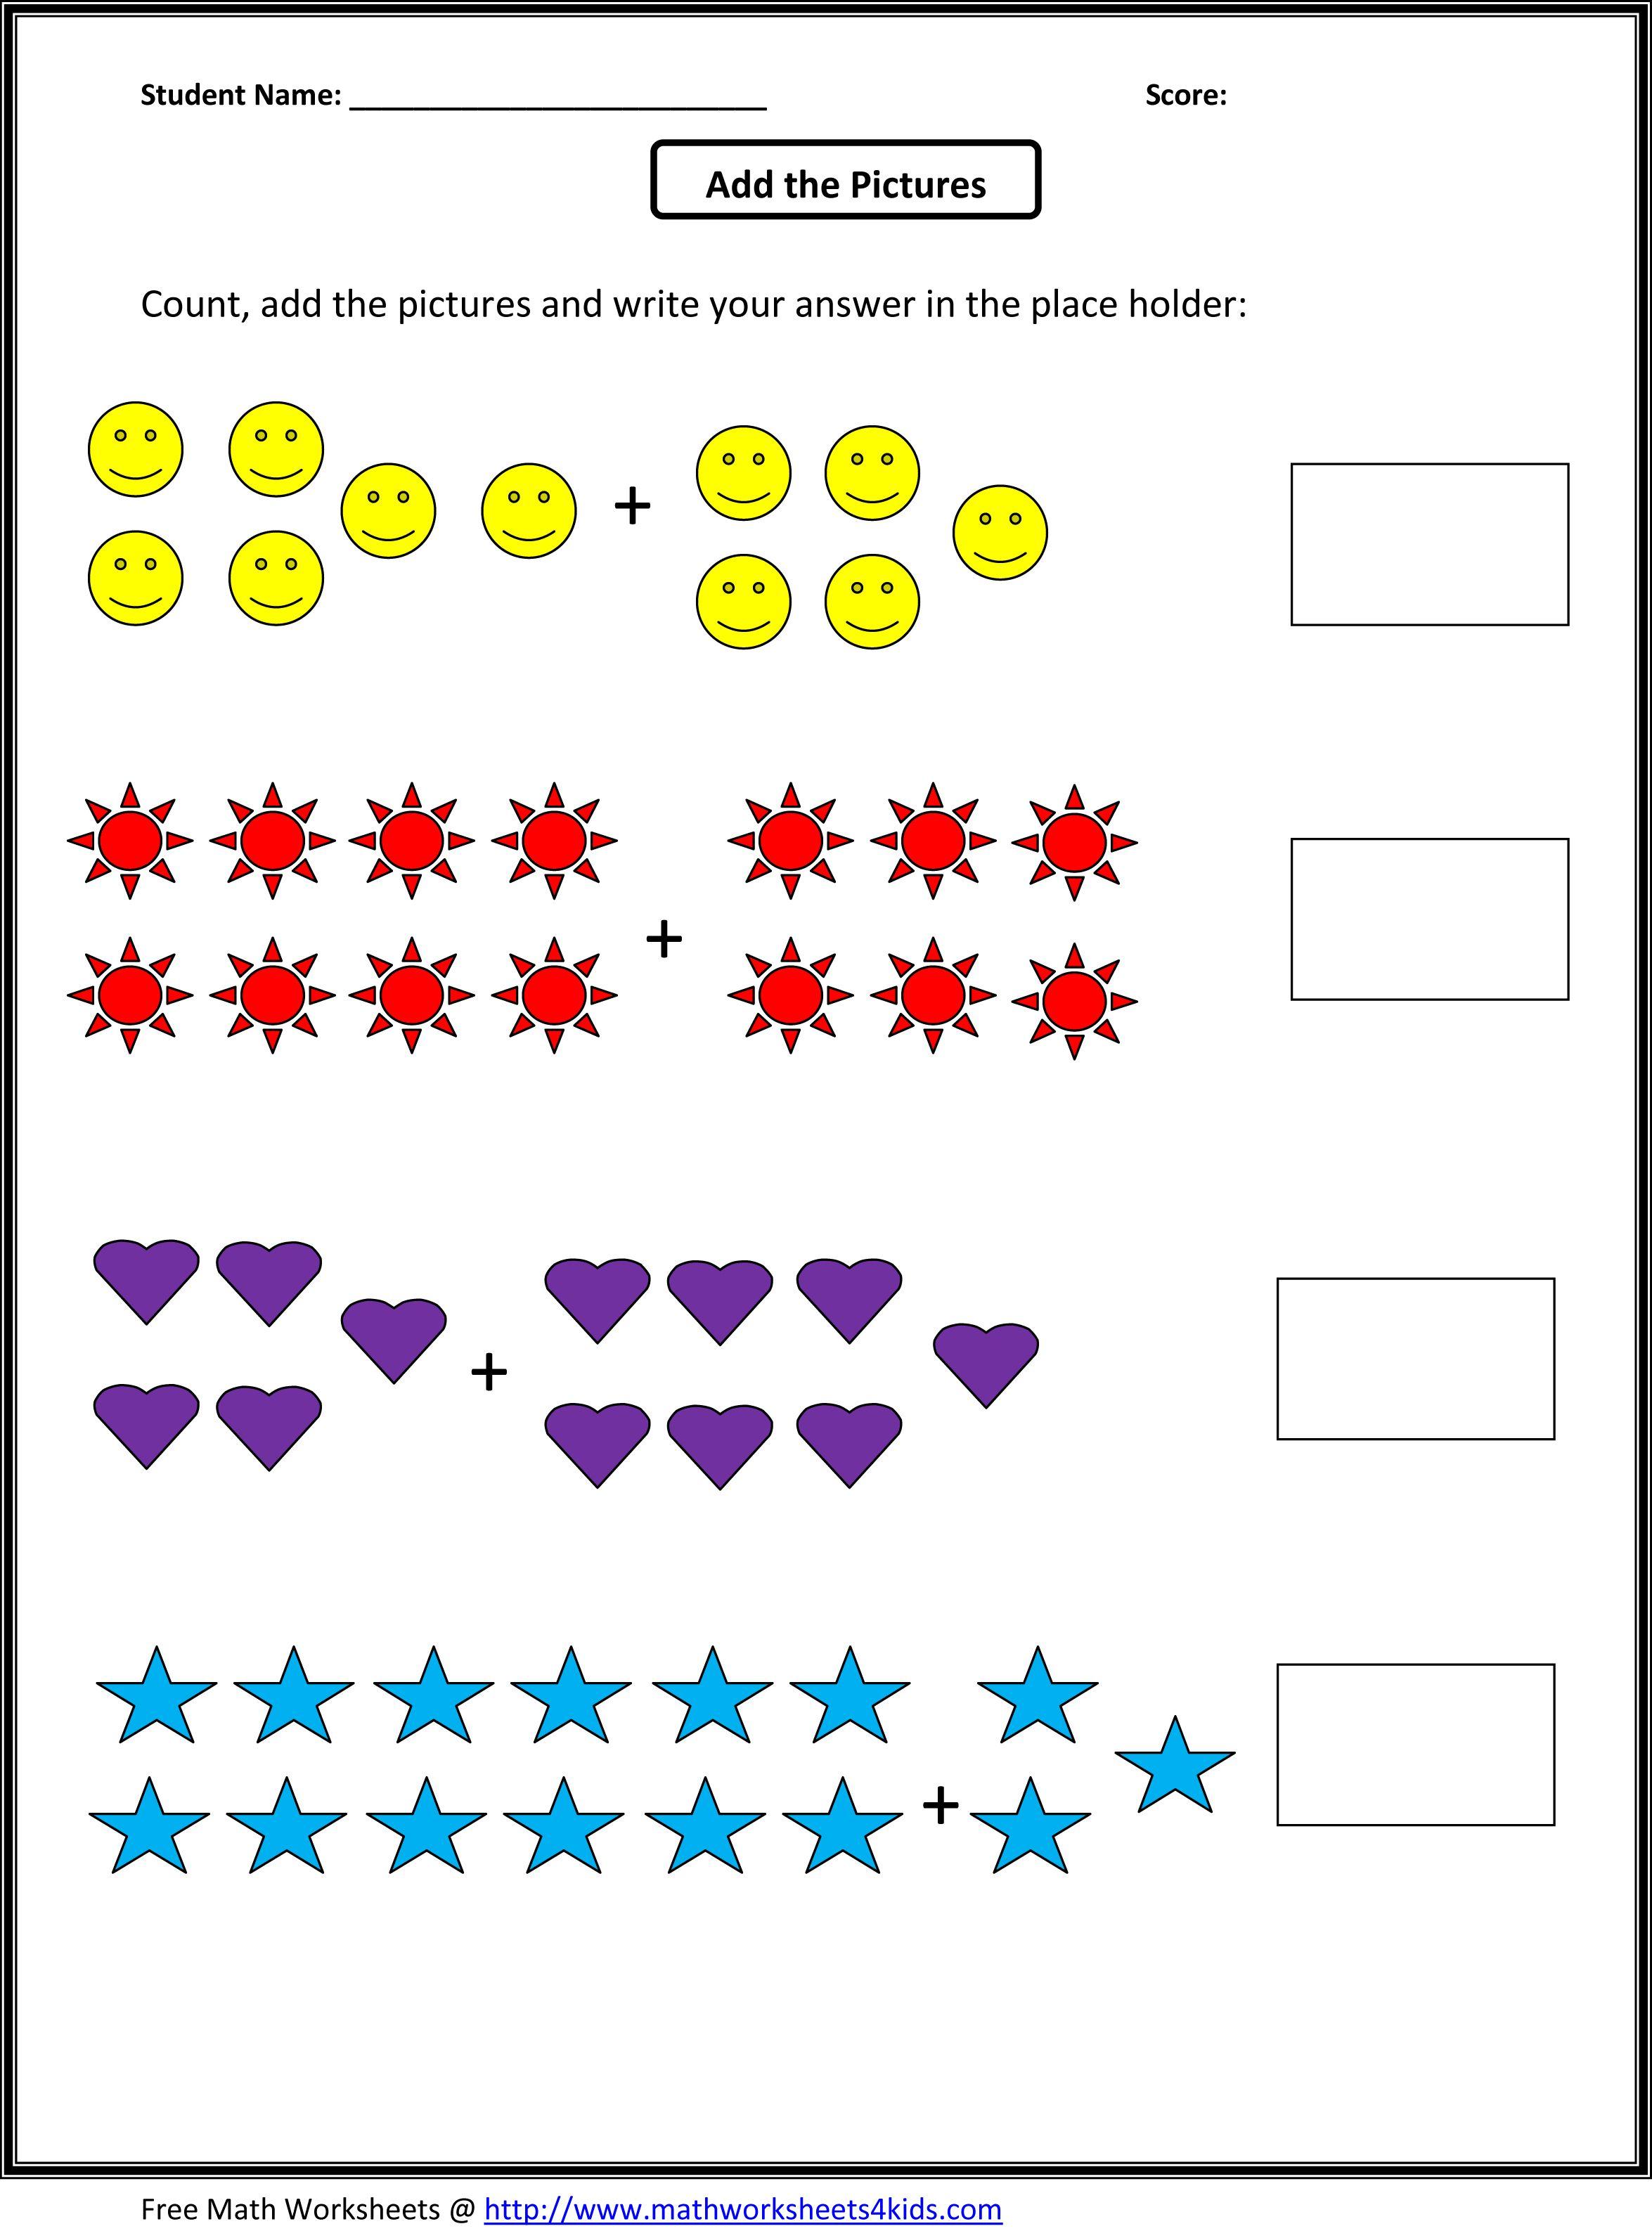 Math Worksheets For Grade 1 On Addition 314105